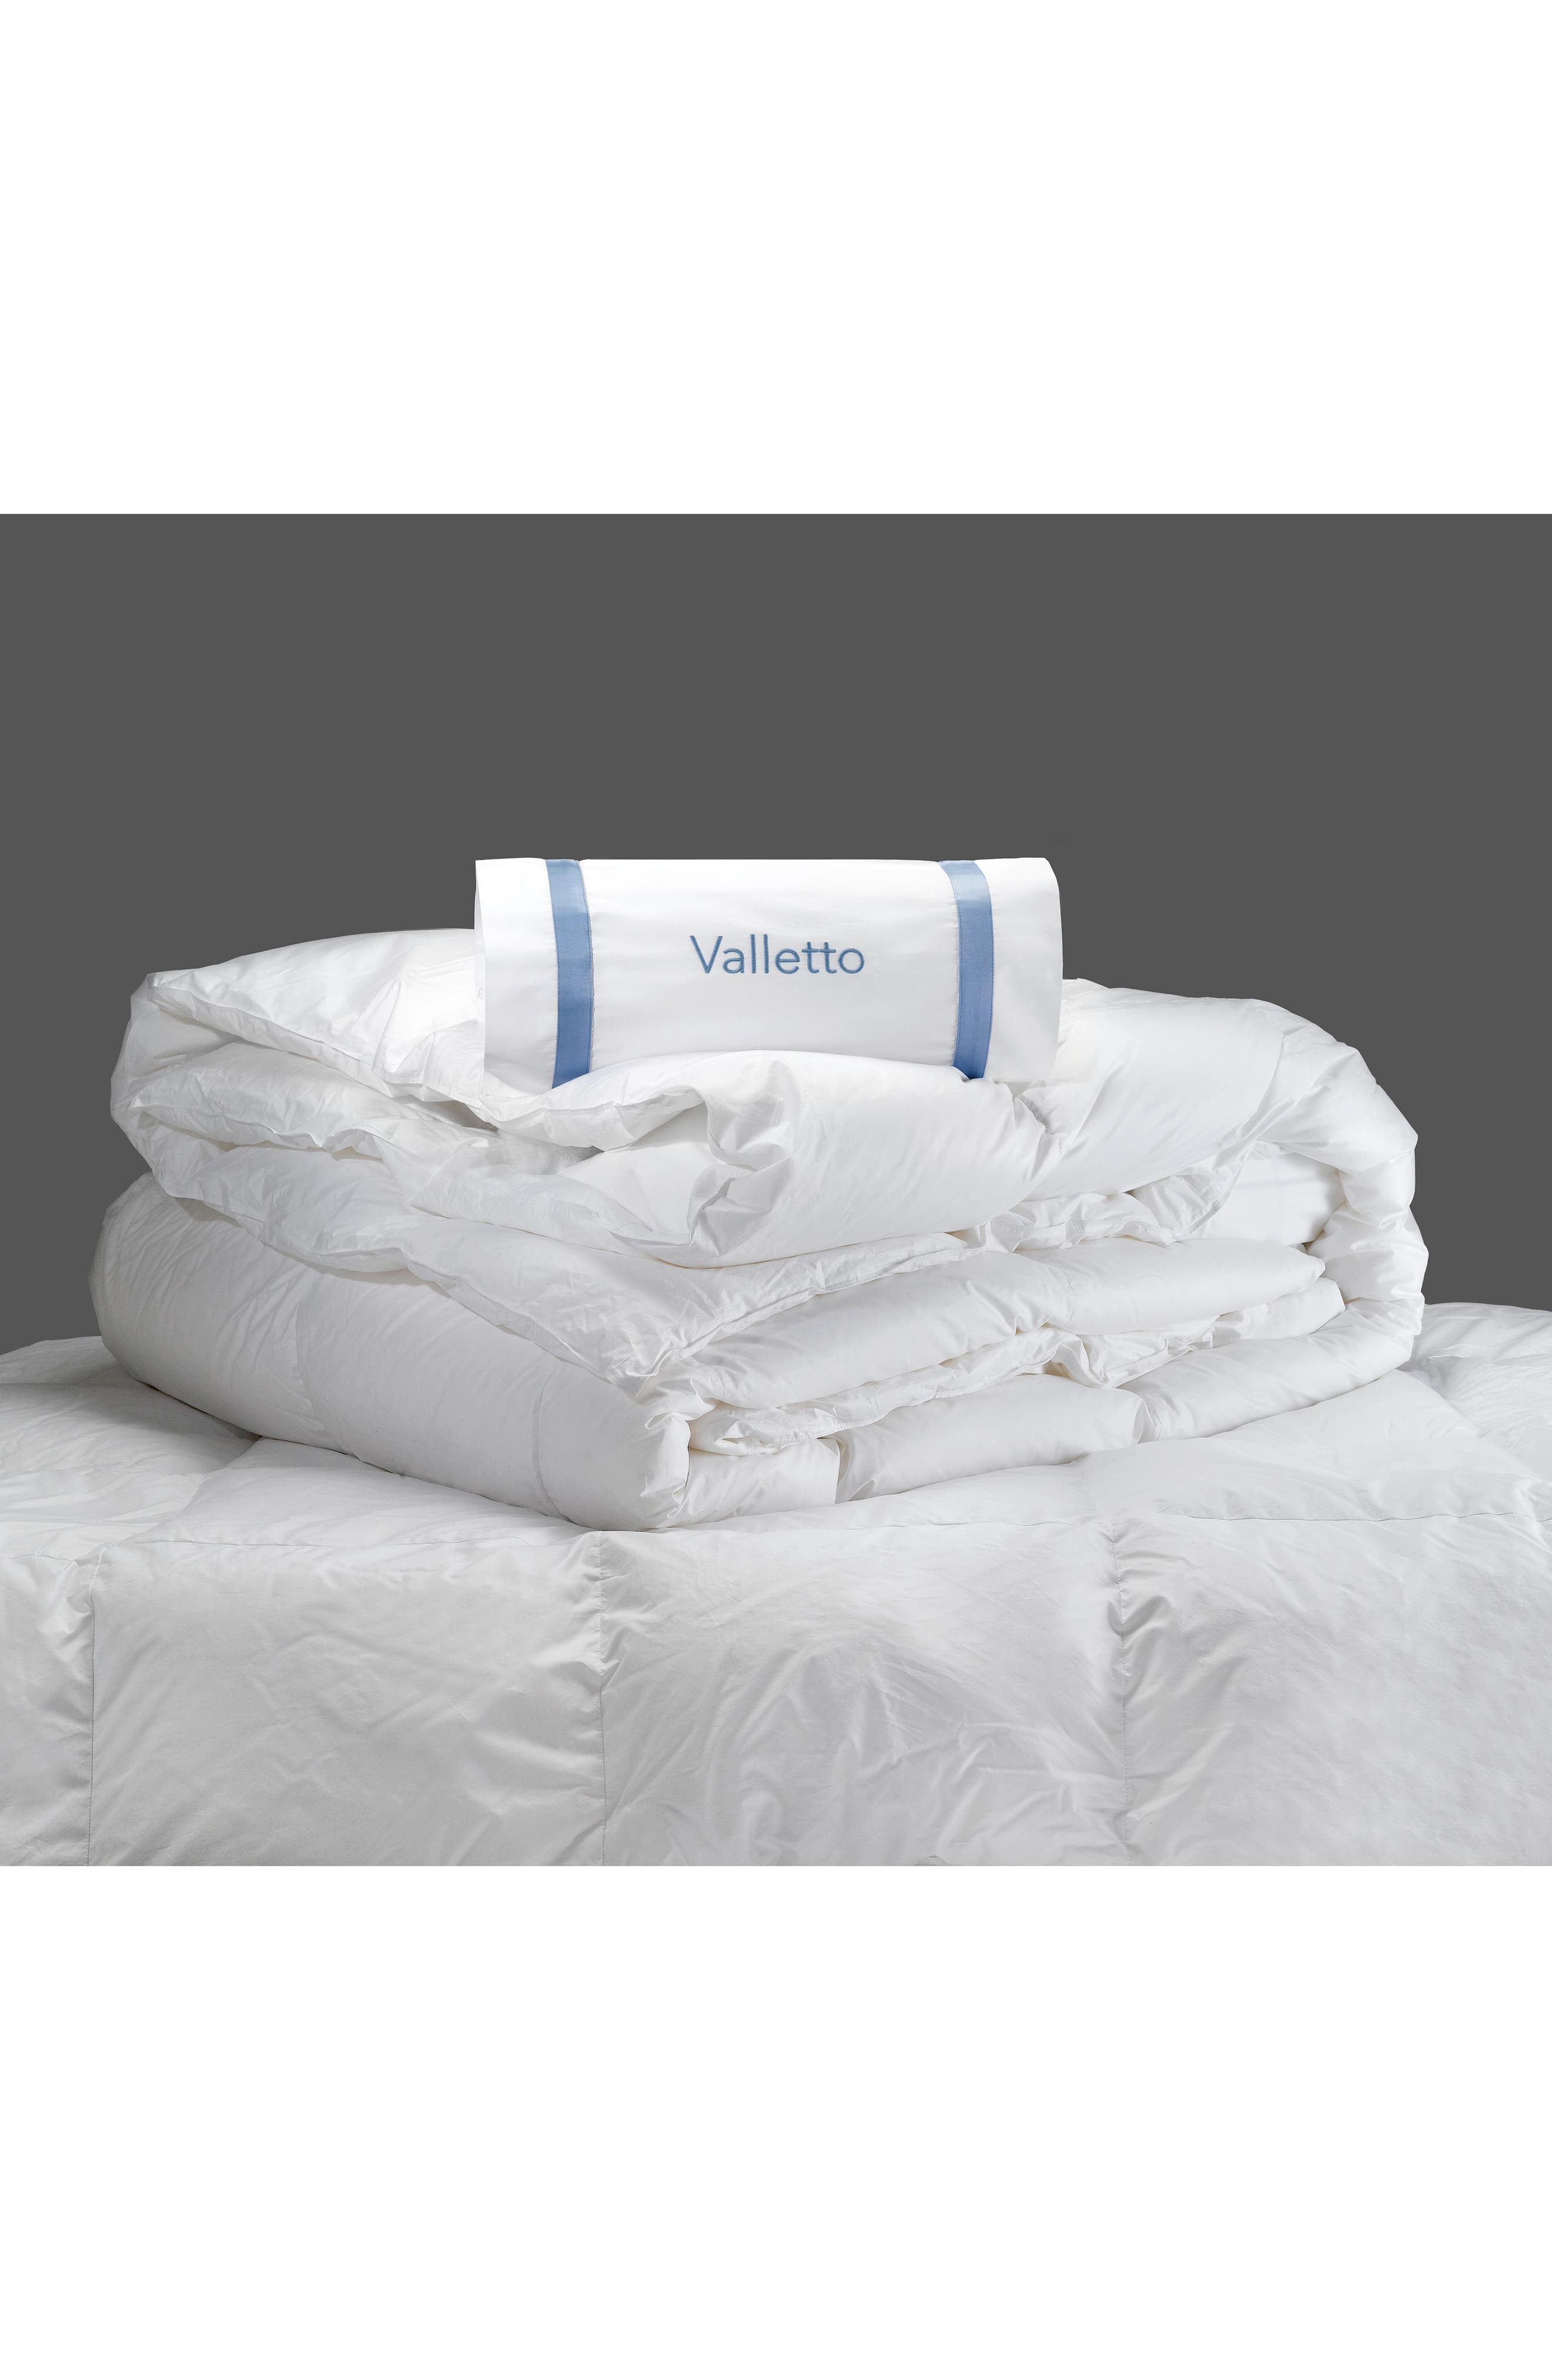 Valletto 650 Fill Power Summer Down Comforter,                             Alternate thumbnail 2, color,                             White